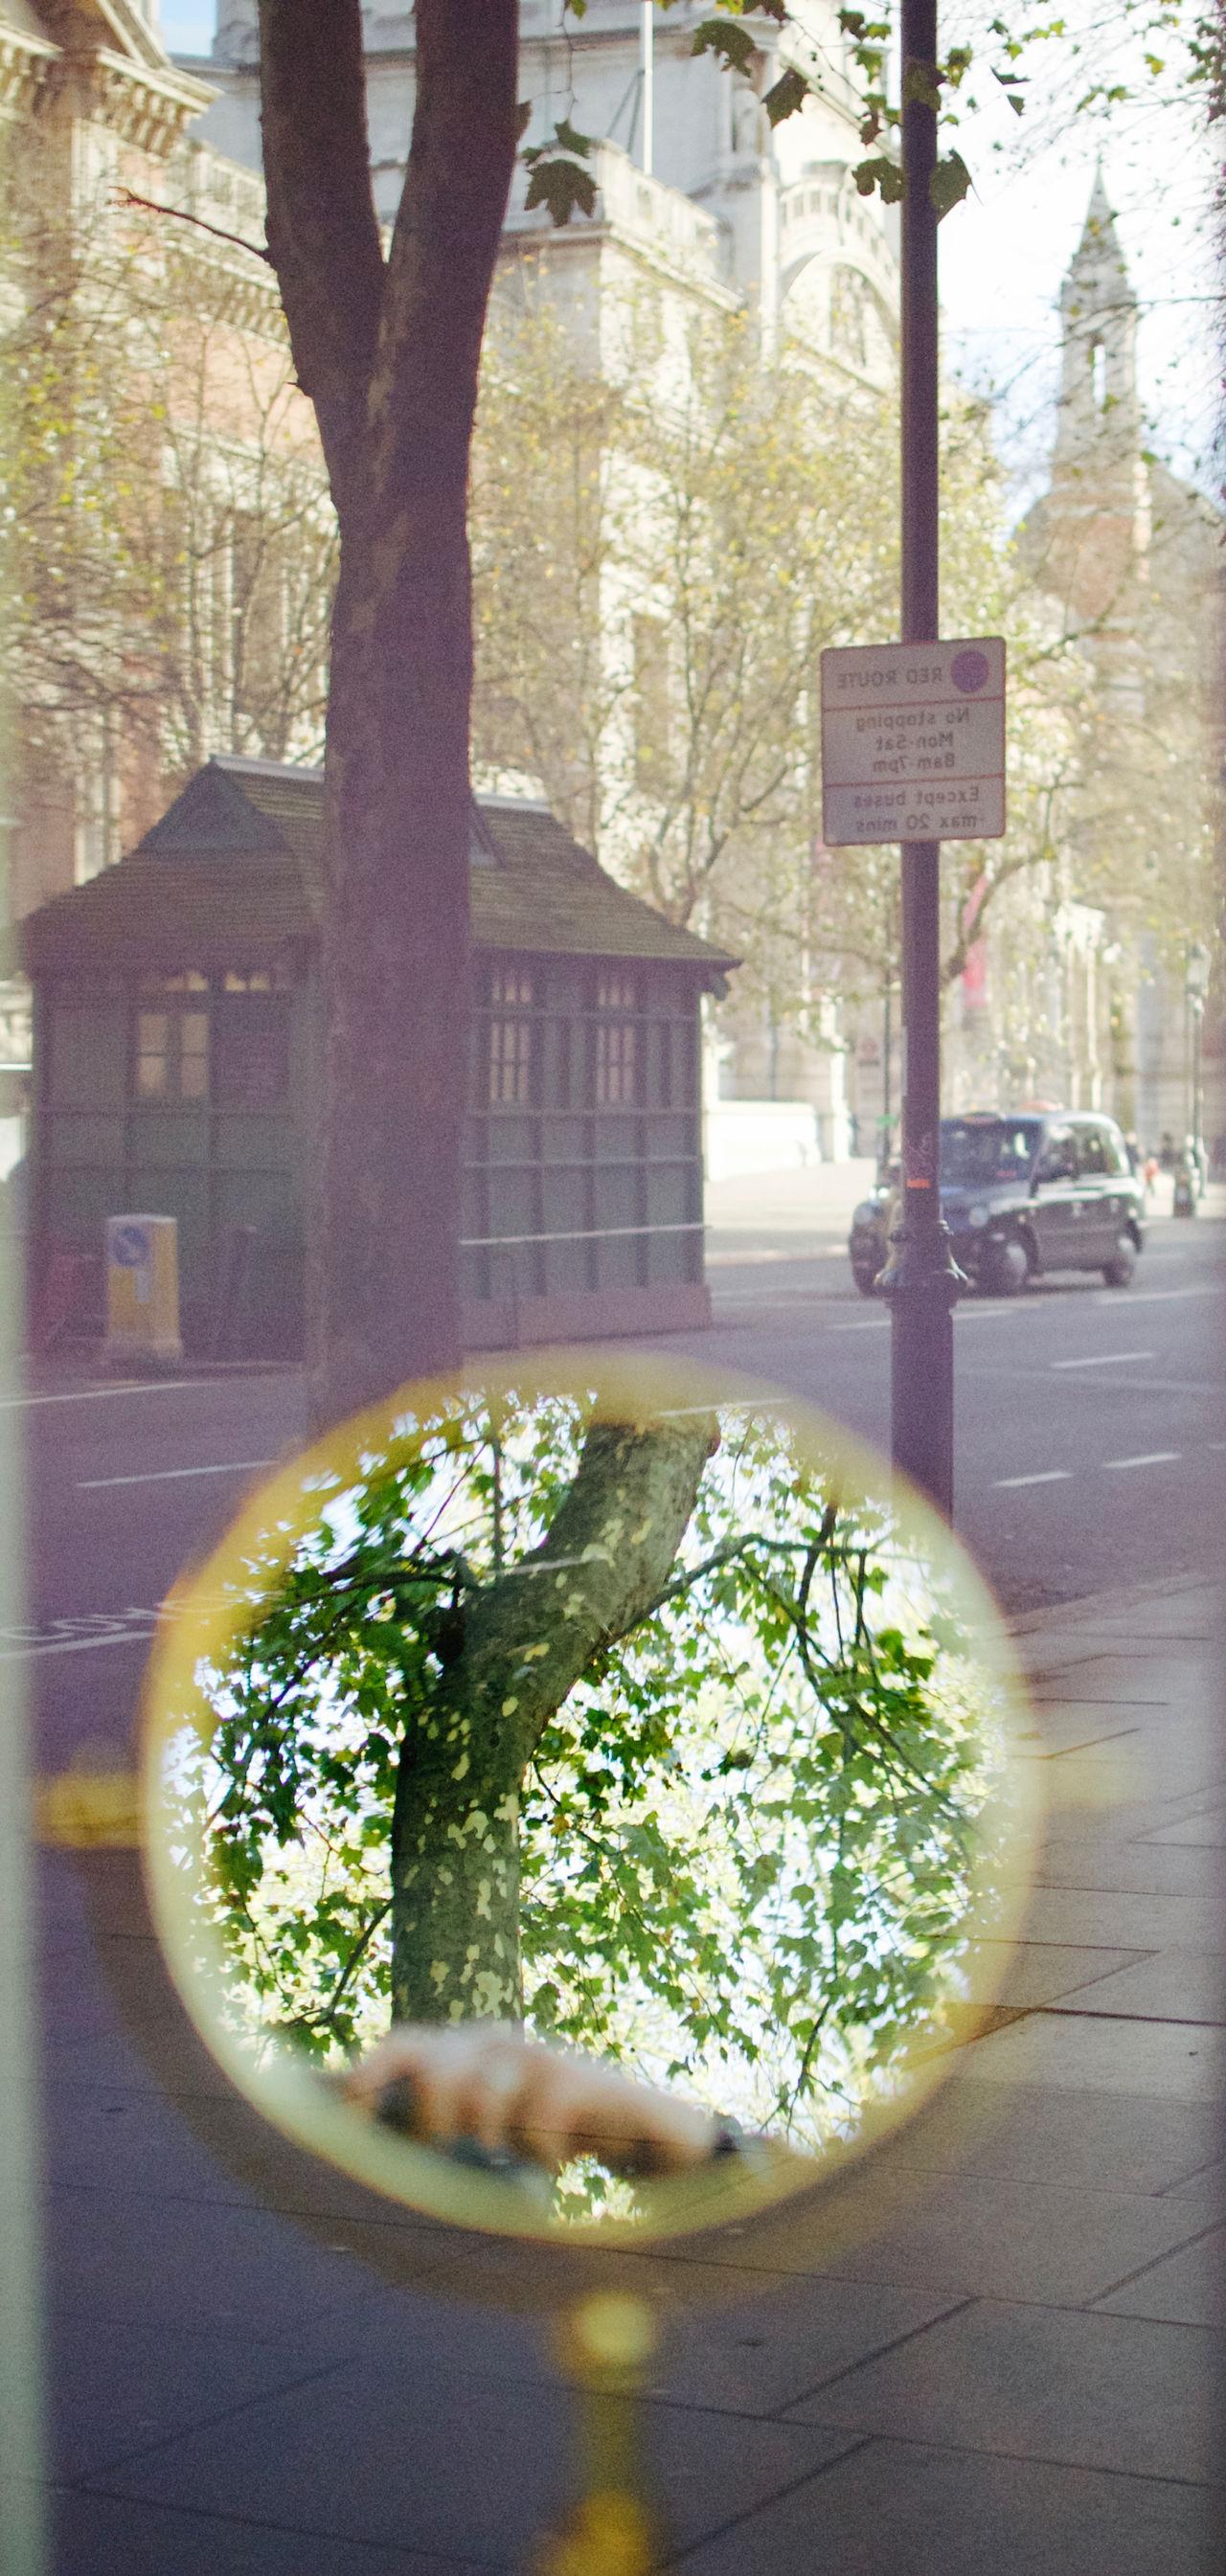 Reflecting on London lifel Londonlife Mirrorshot Black Cabs